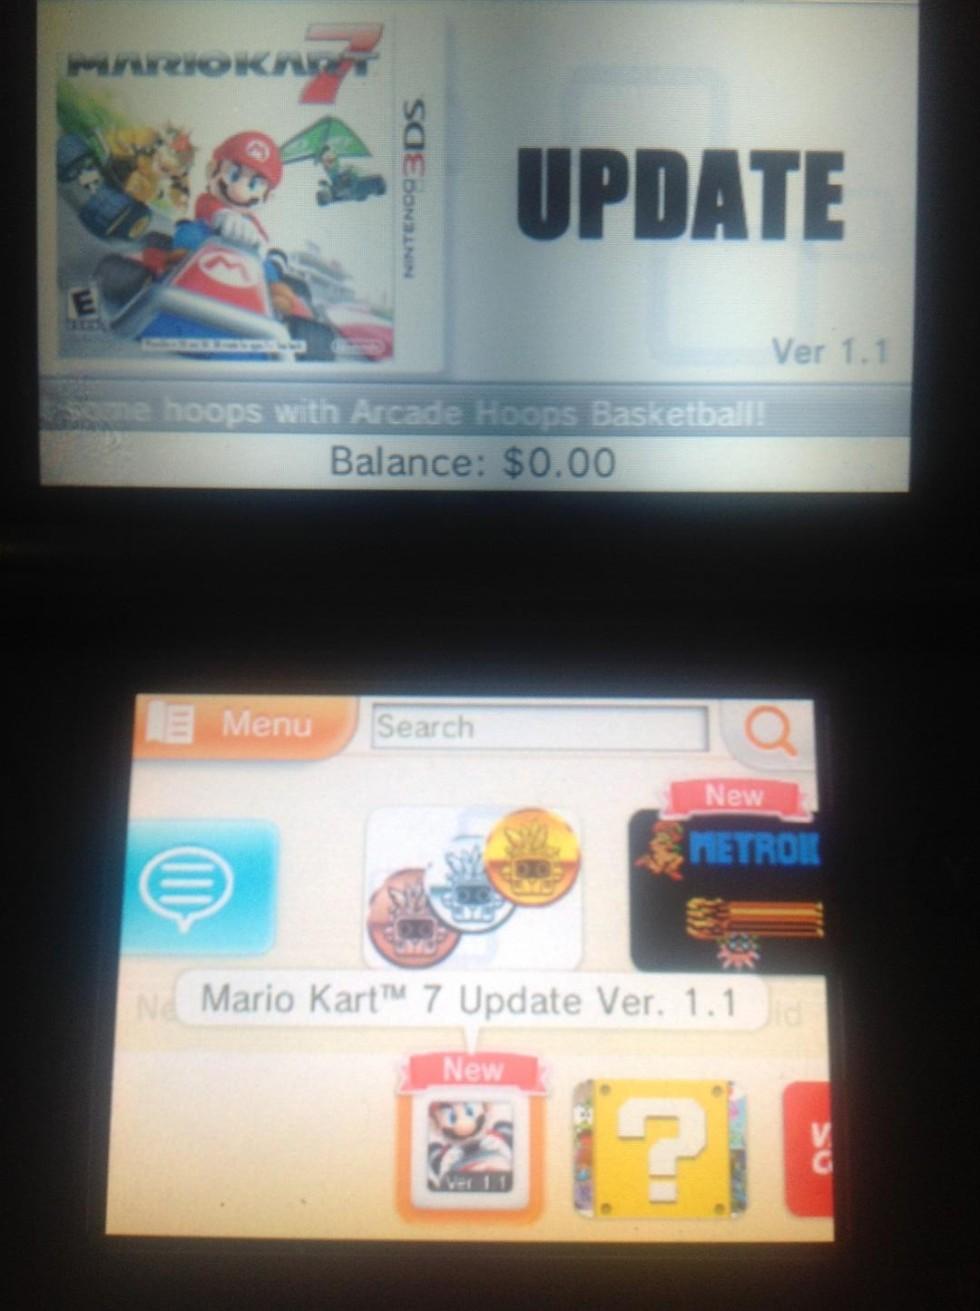 mk7_update_02 (Large)